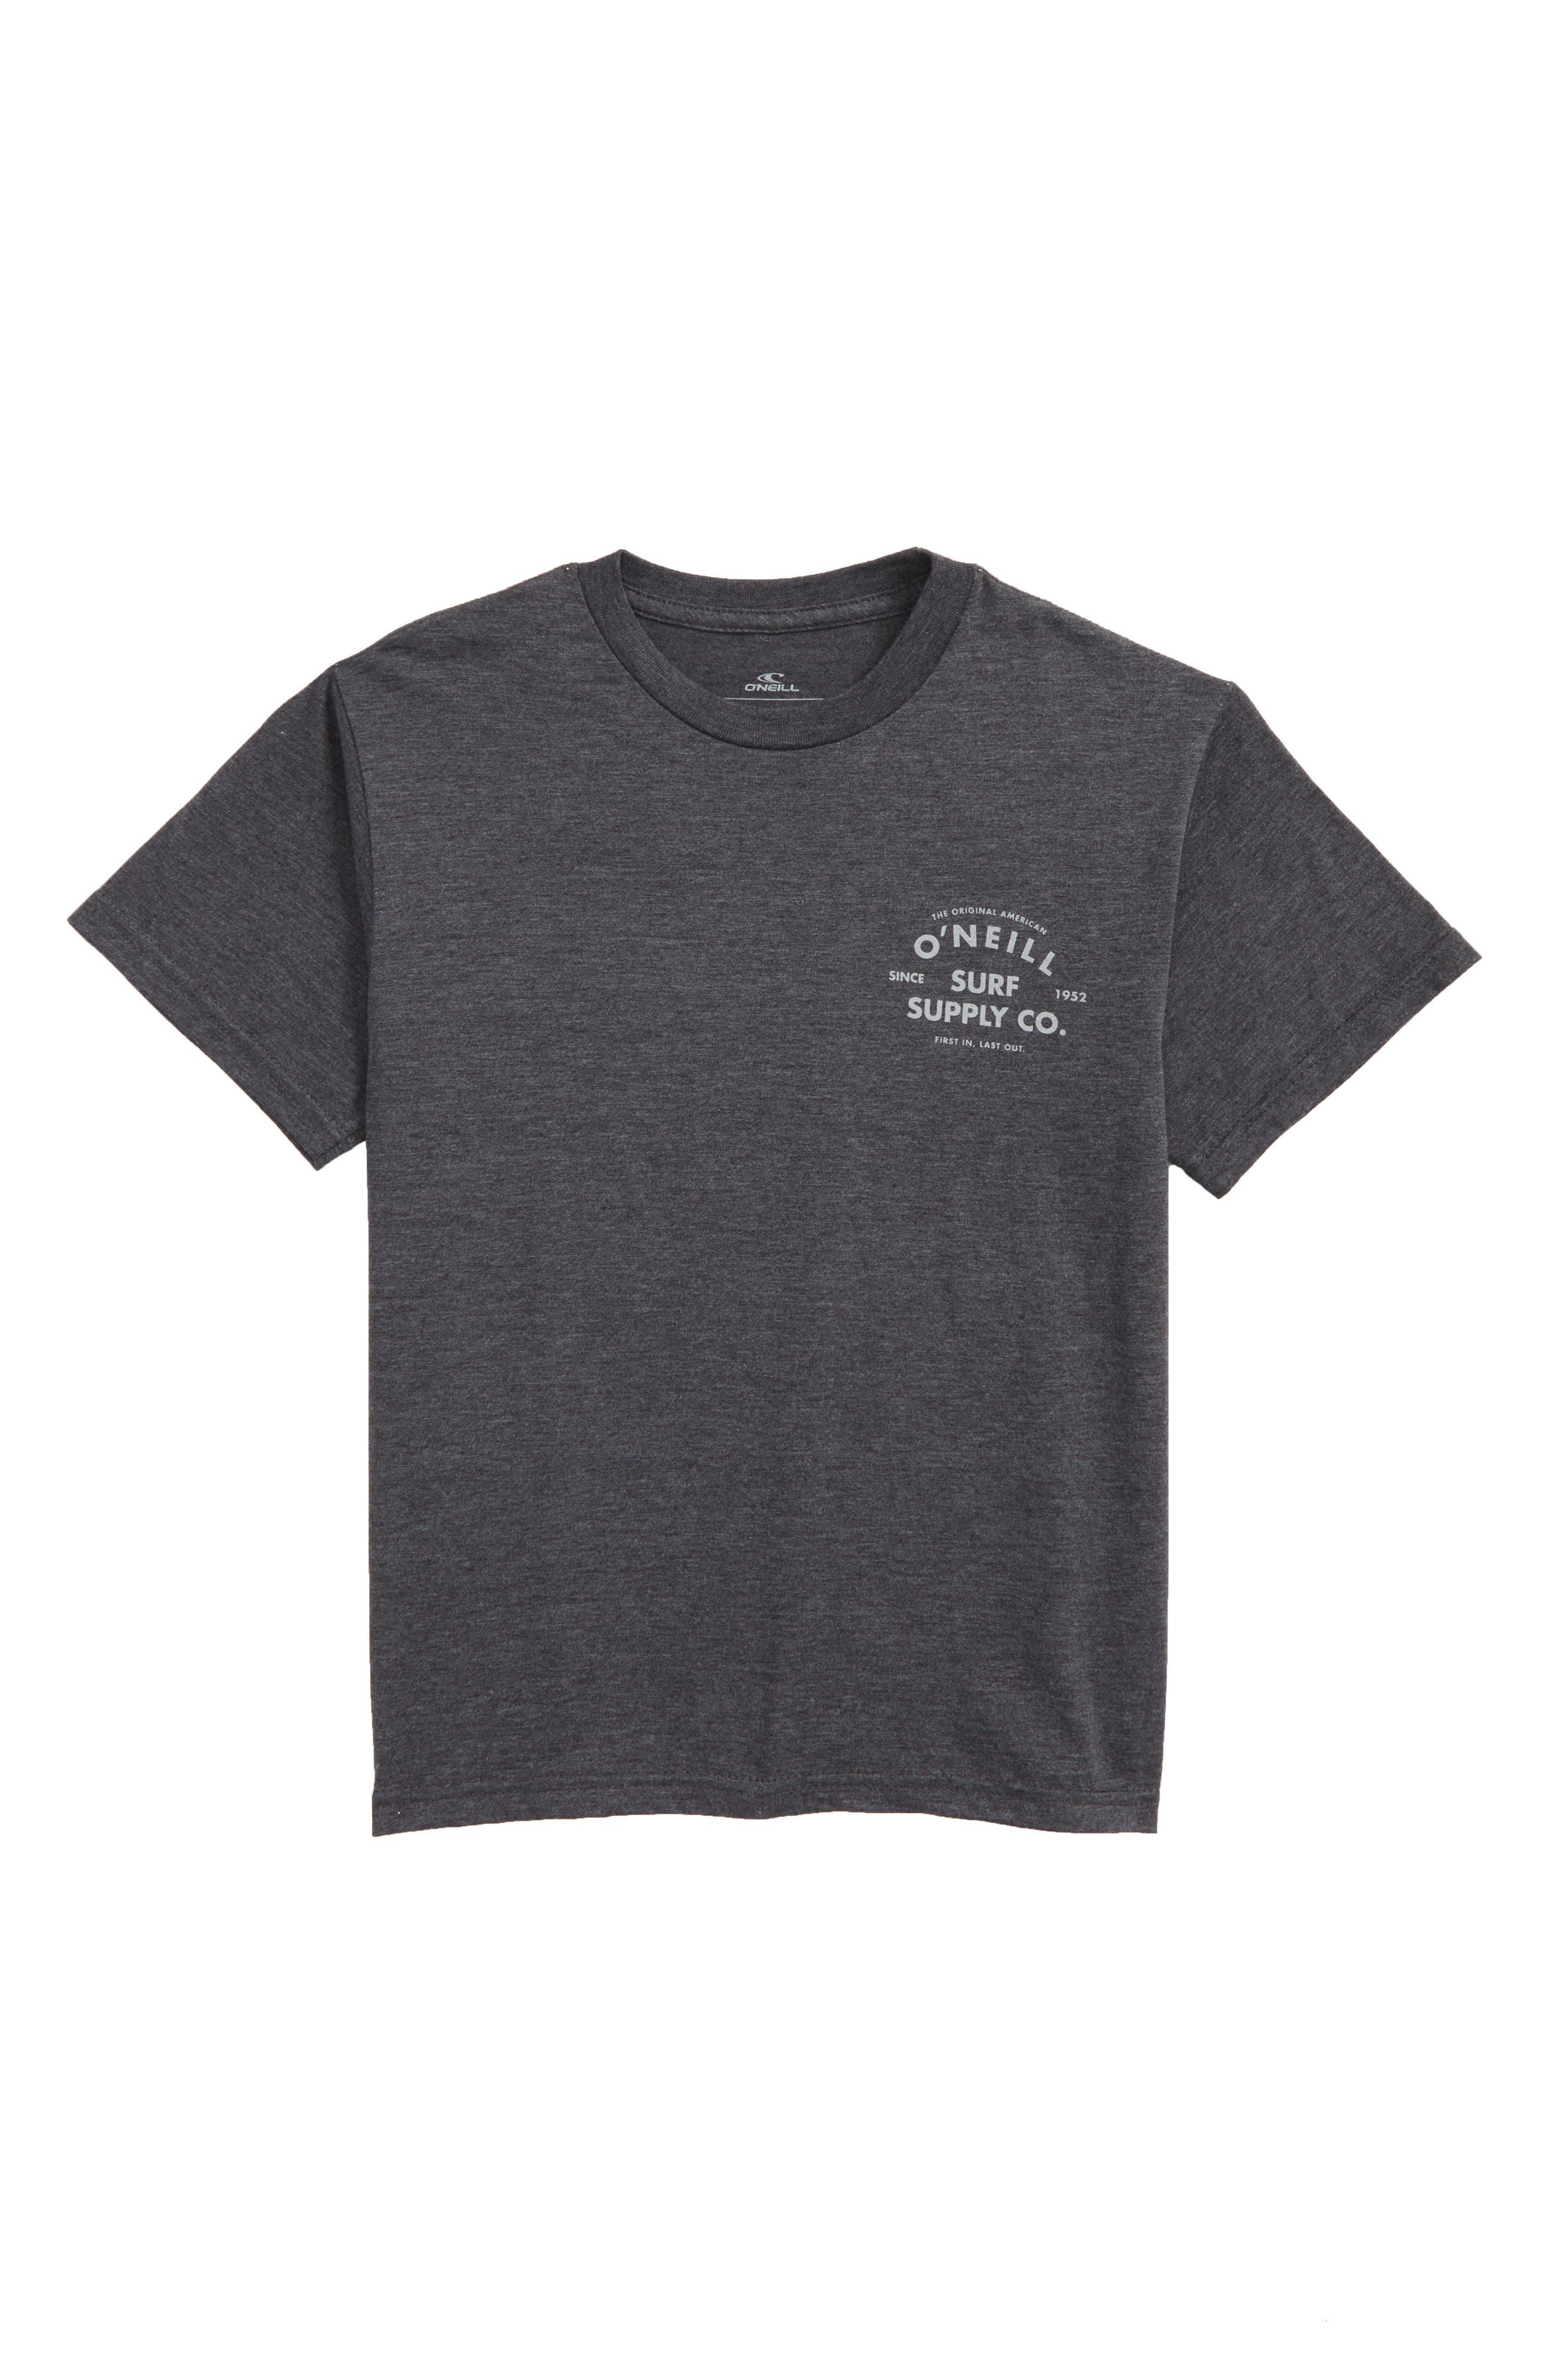 Gonner Graphic T-Shirt,                             Main thumbnail 1, color,                             001